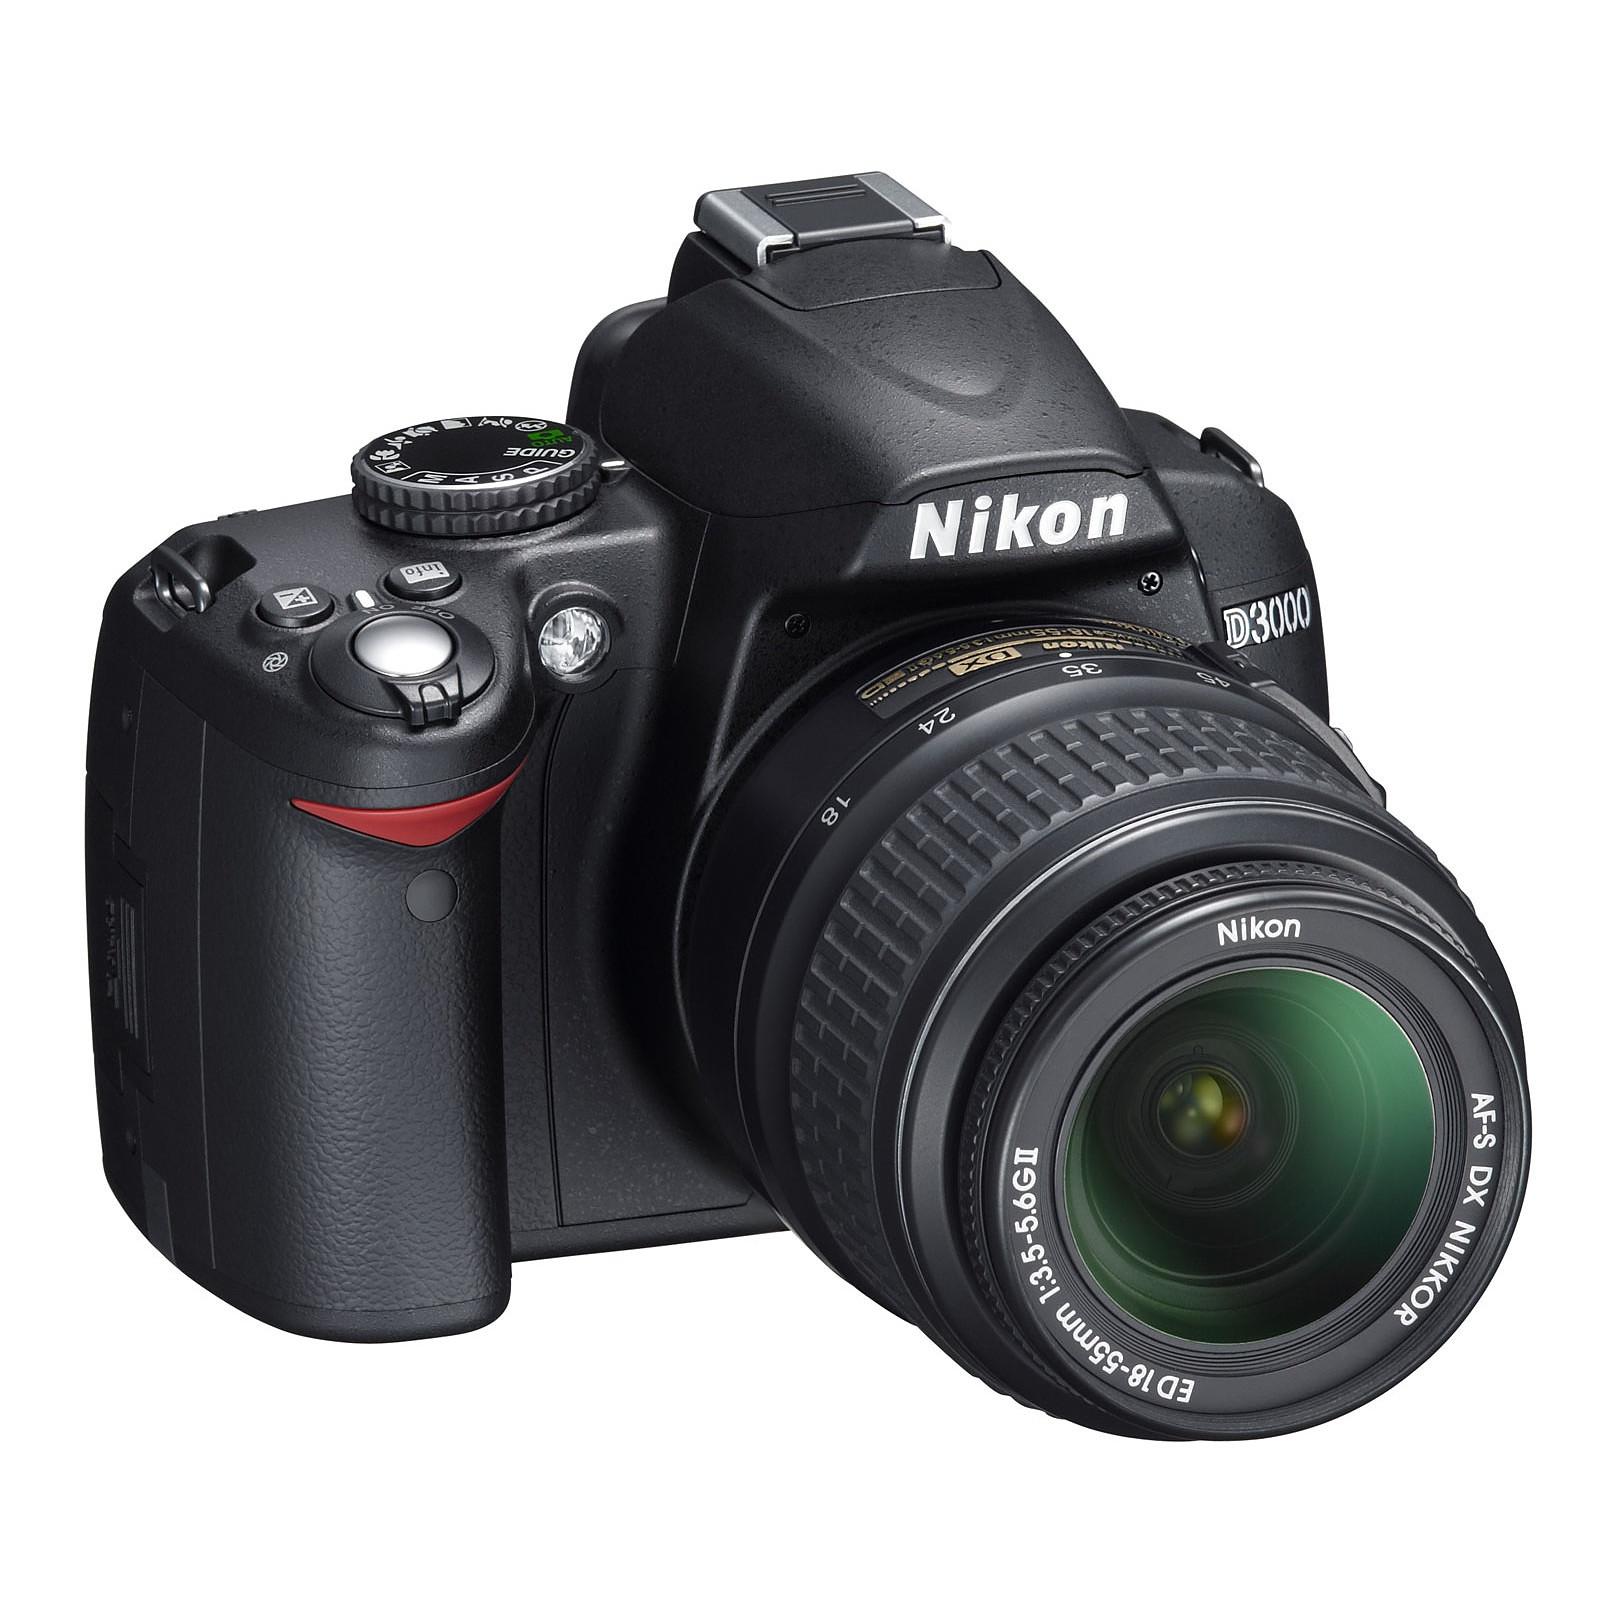 nikon d3000 objectif vr dx 18 55 mm f 3 5 5 6g appareil photo rh ldlc com Nikon D4000 Nikon D3200